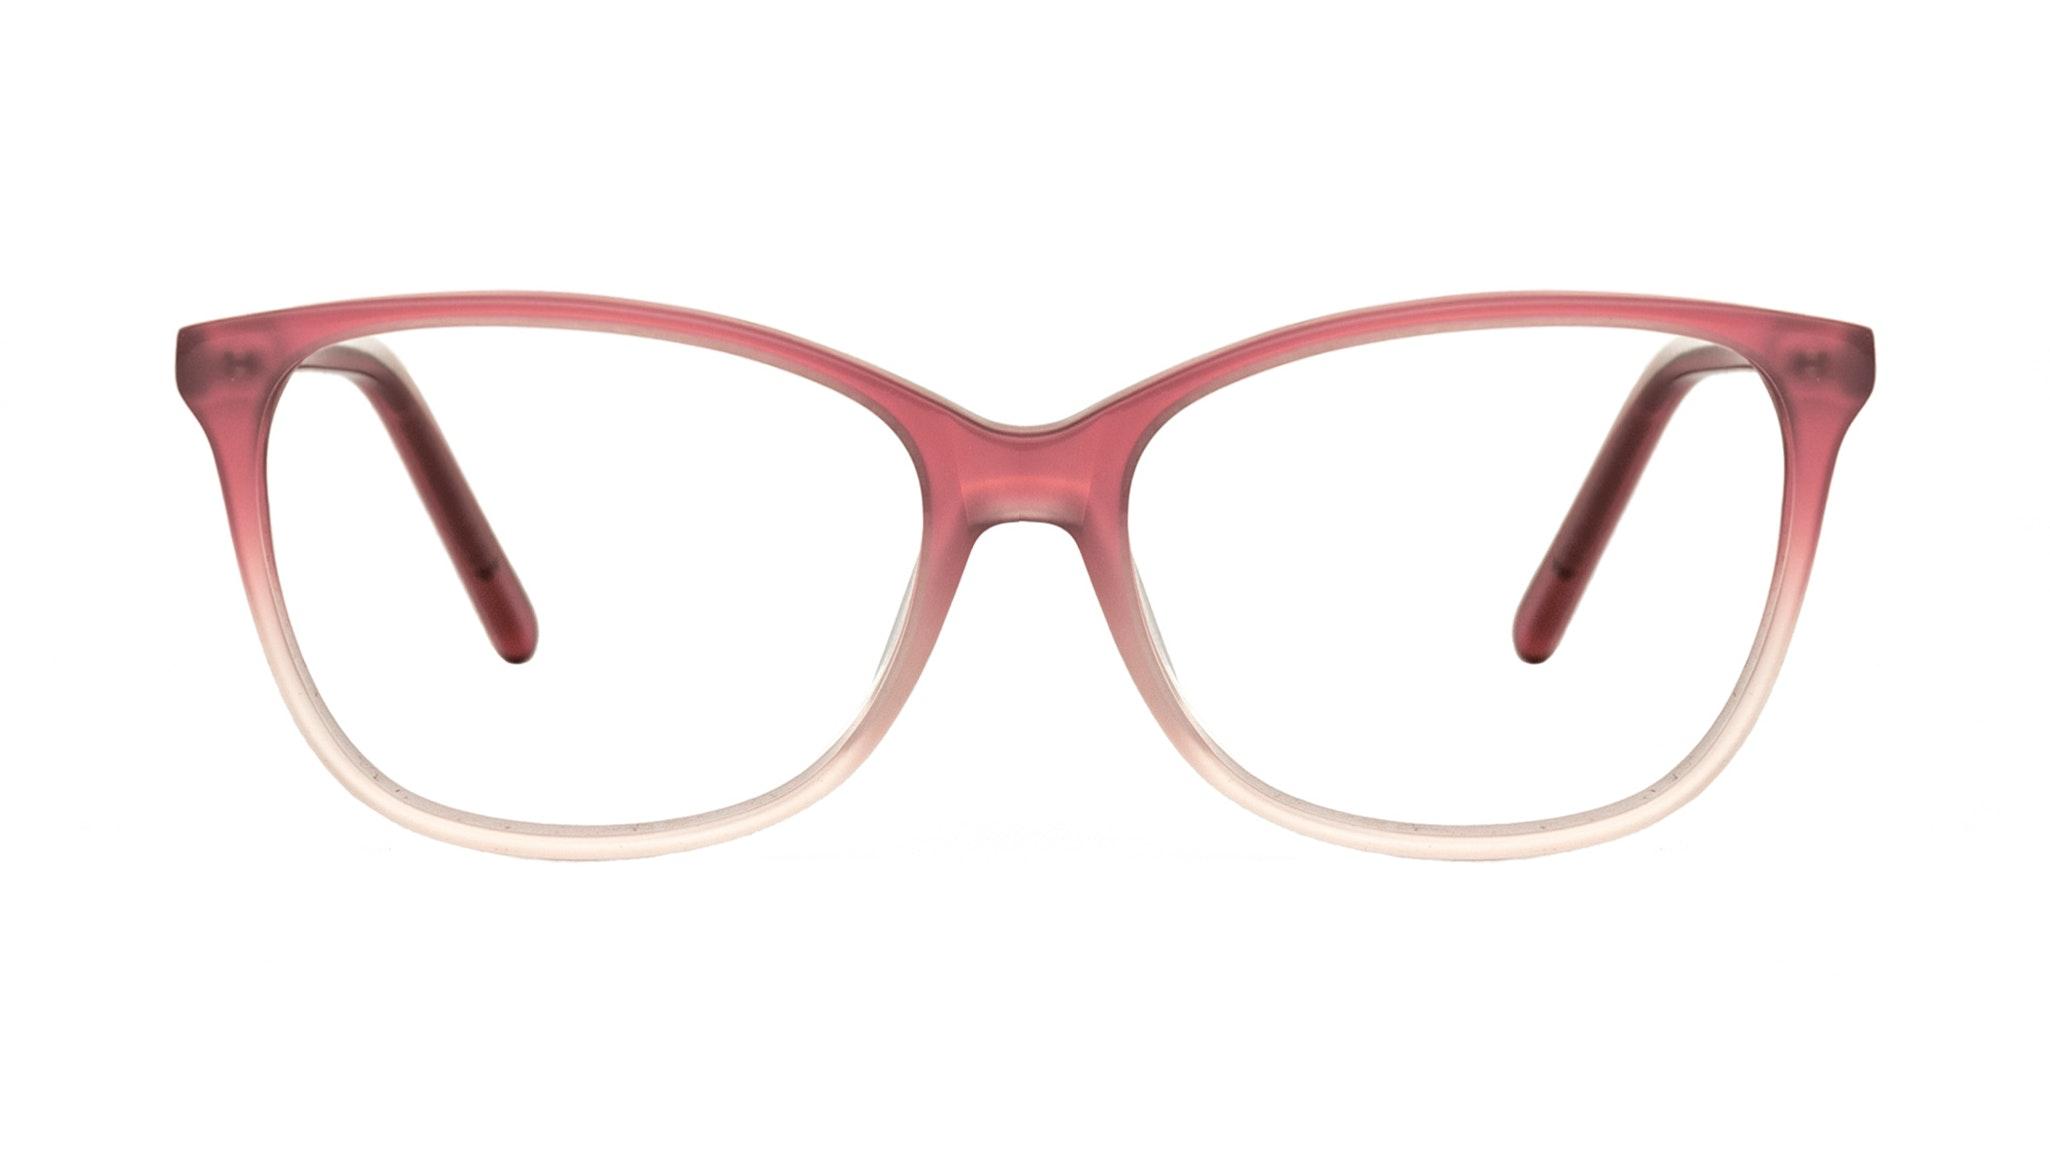 Affordable Fashion Glasses Cat Eye Eyeglasses Women Flair Rose Quartz